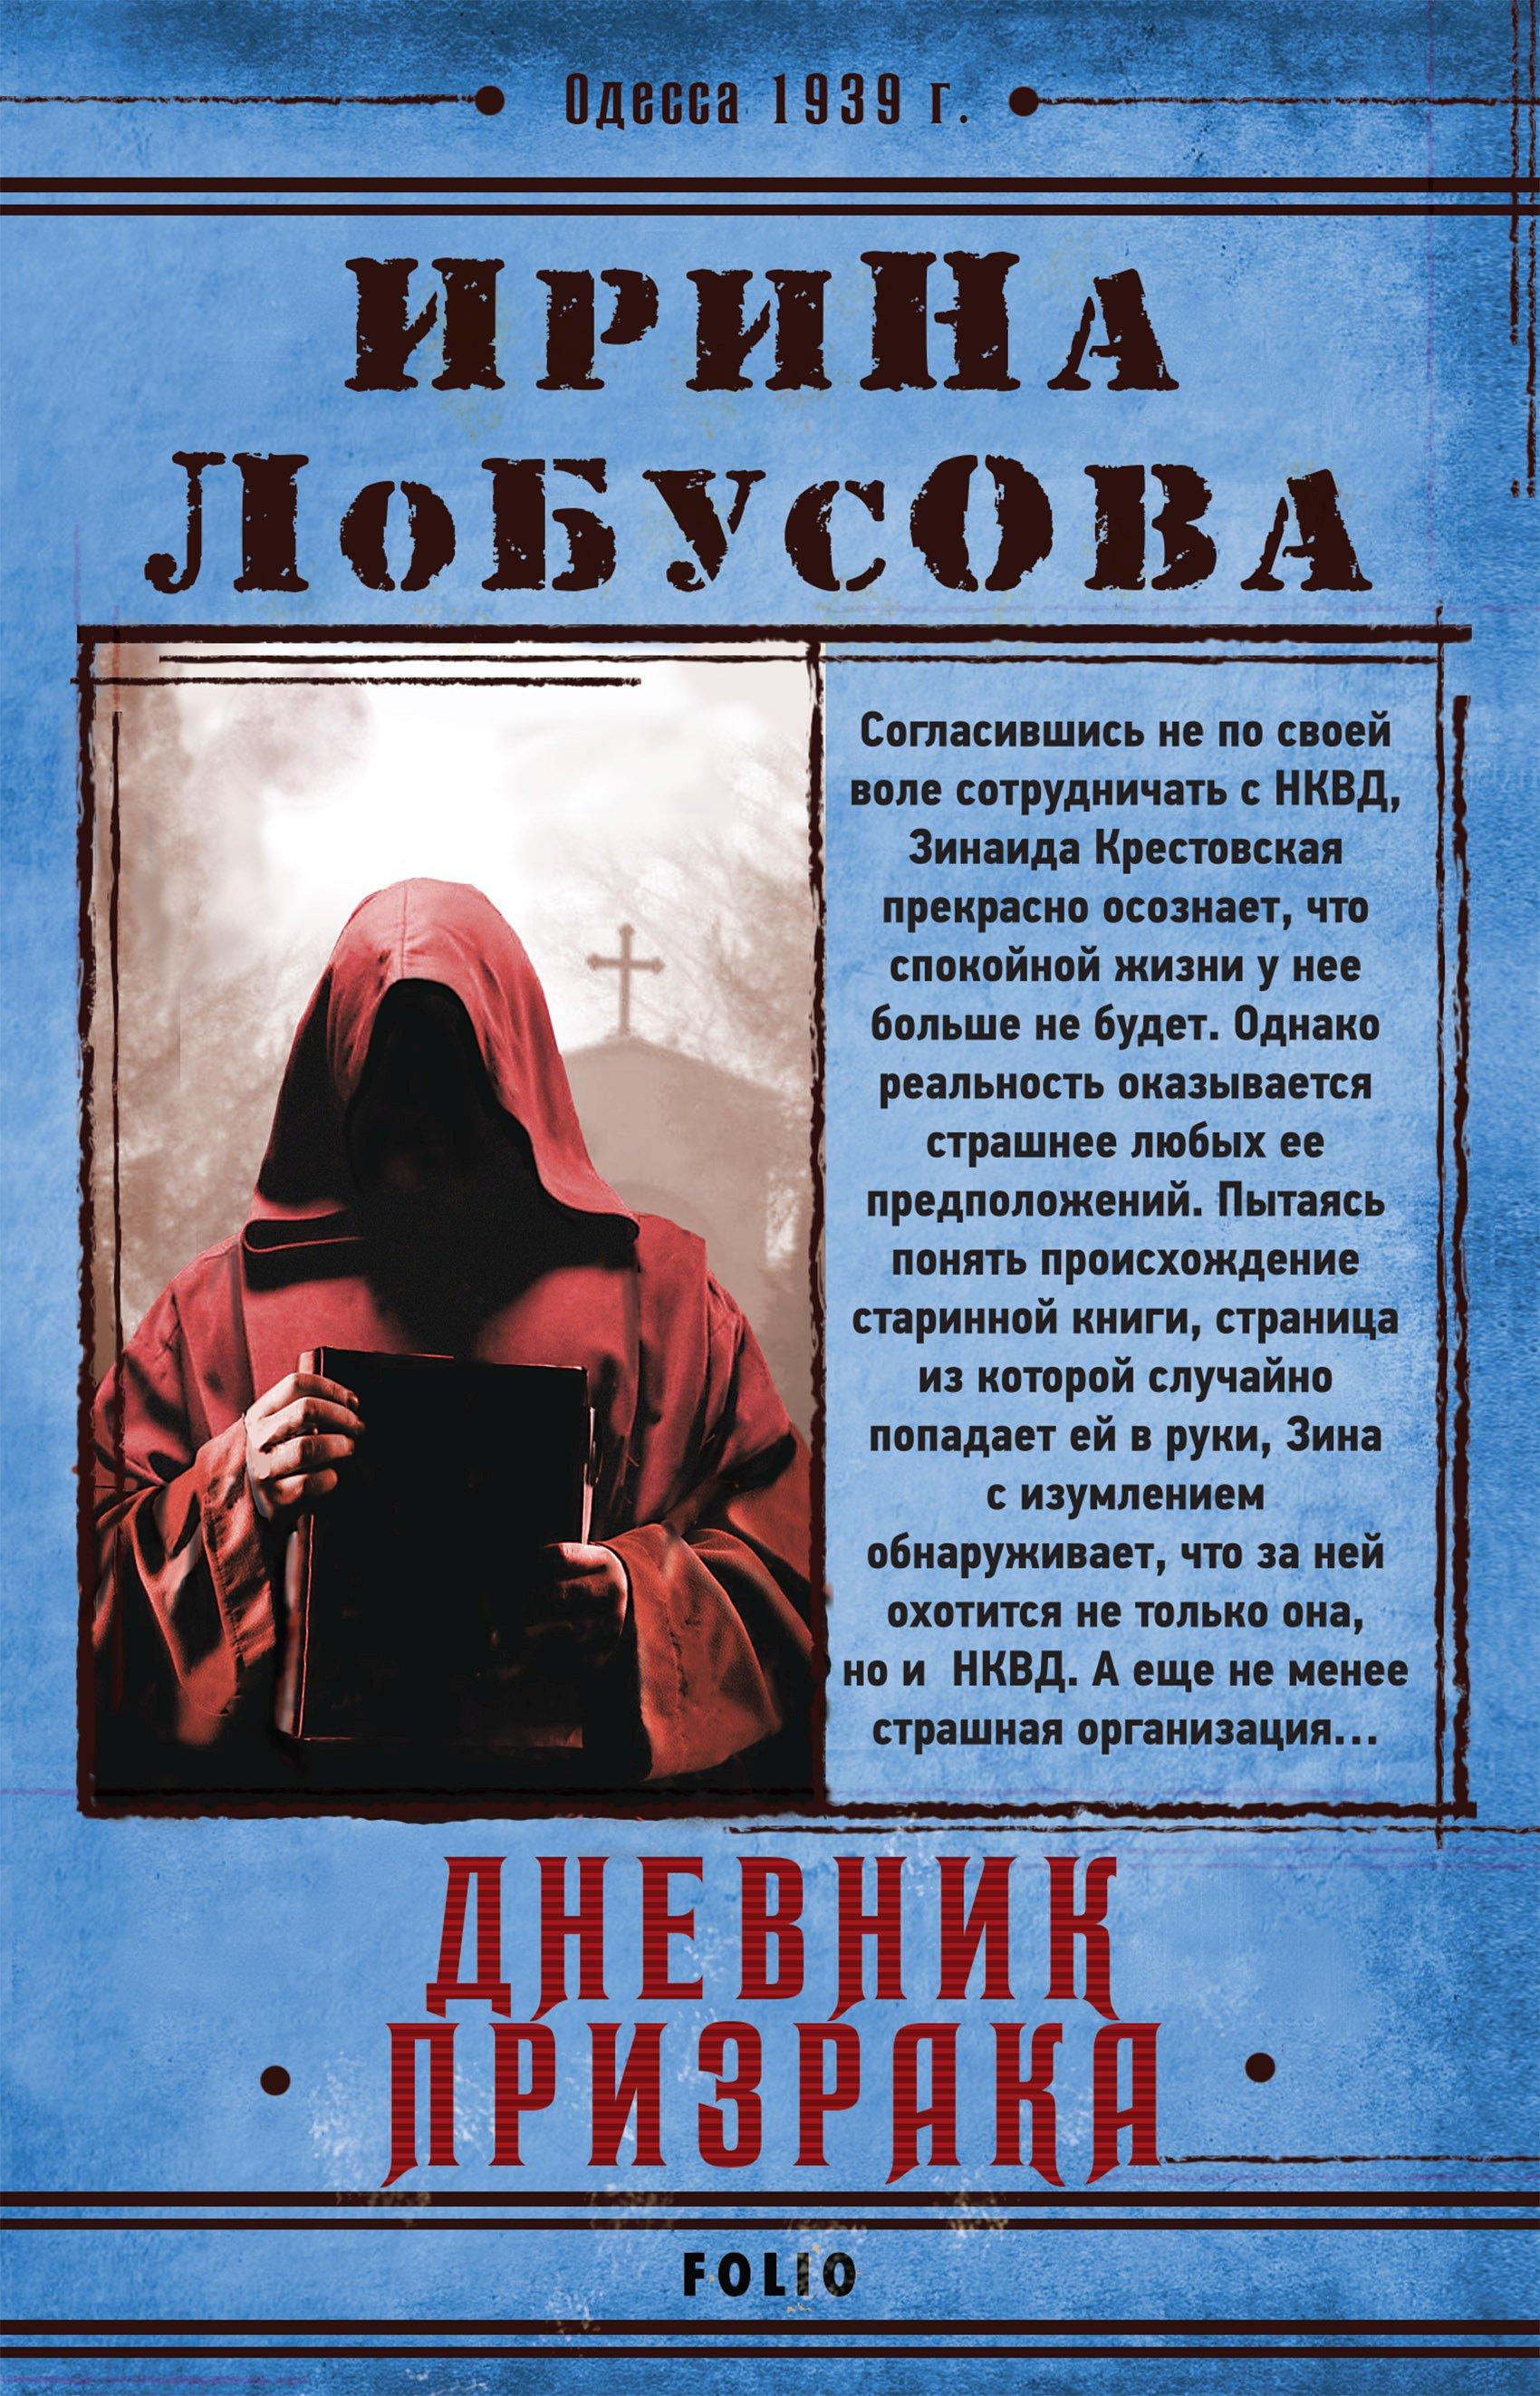 Ирина Лобусова - Дневник призрака